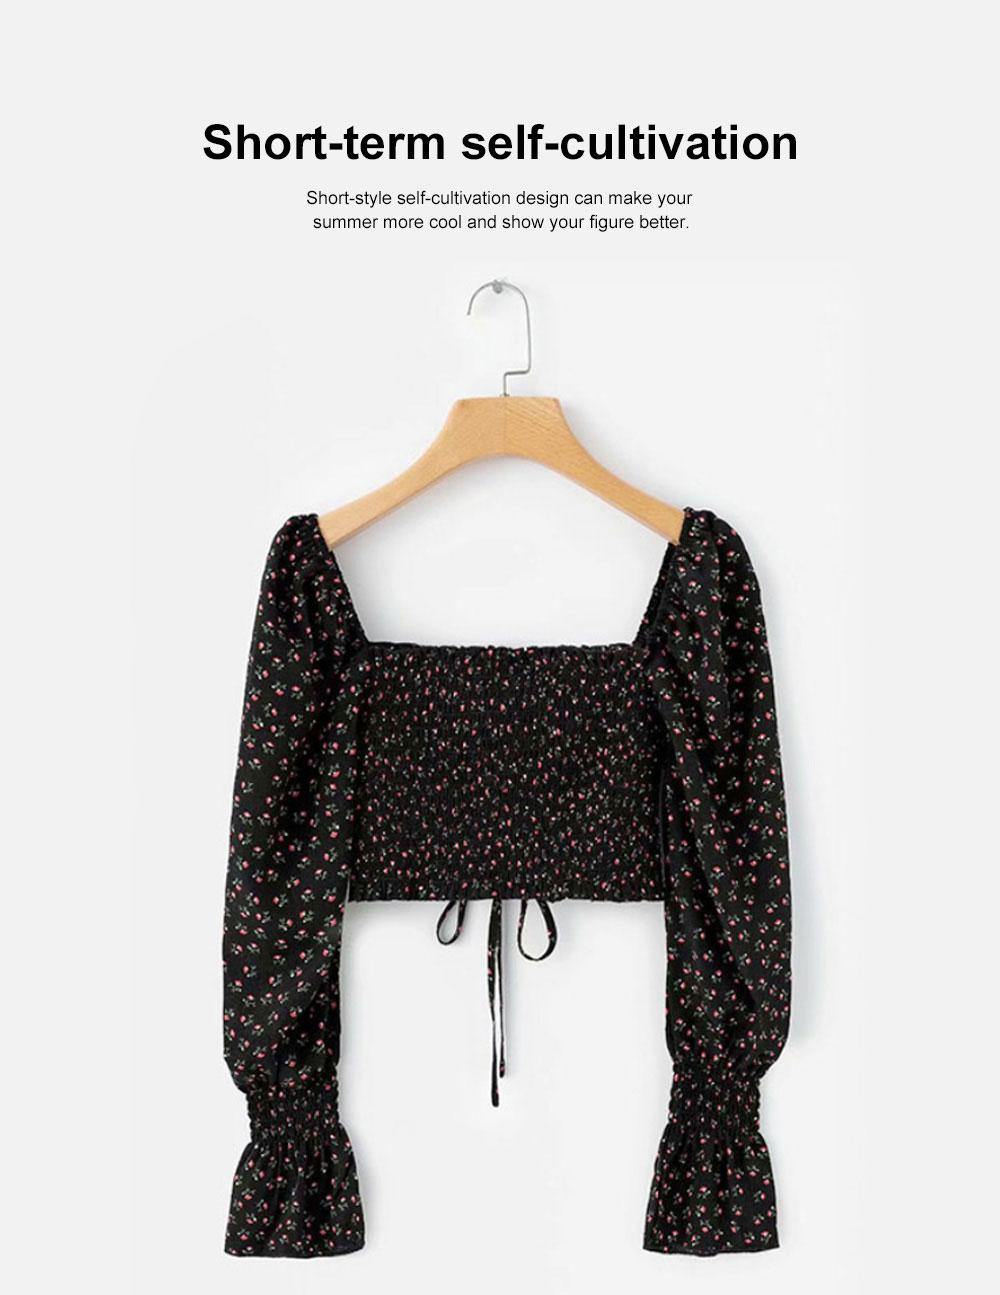 Super-short Chiffon Jacket 2019 Summer Autumn Slim Floral Retro Chiffon Blouses With Bell Sleeve 1